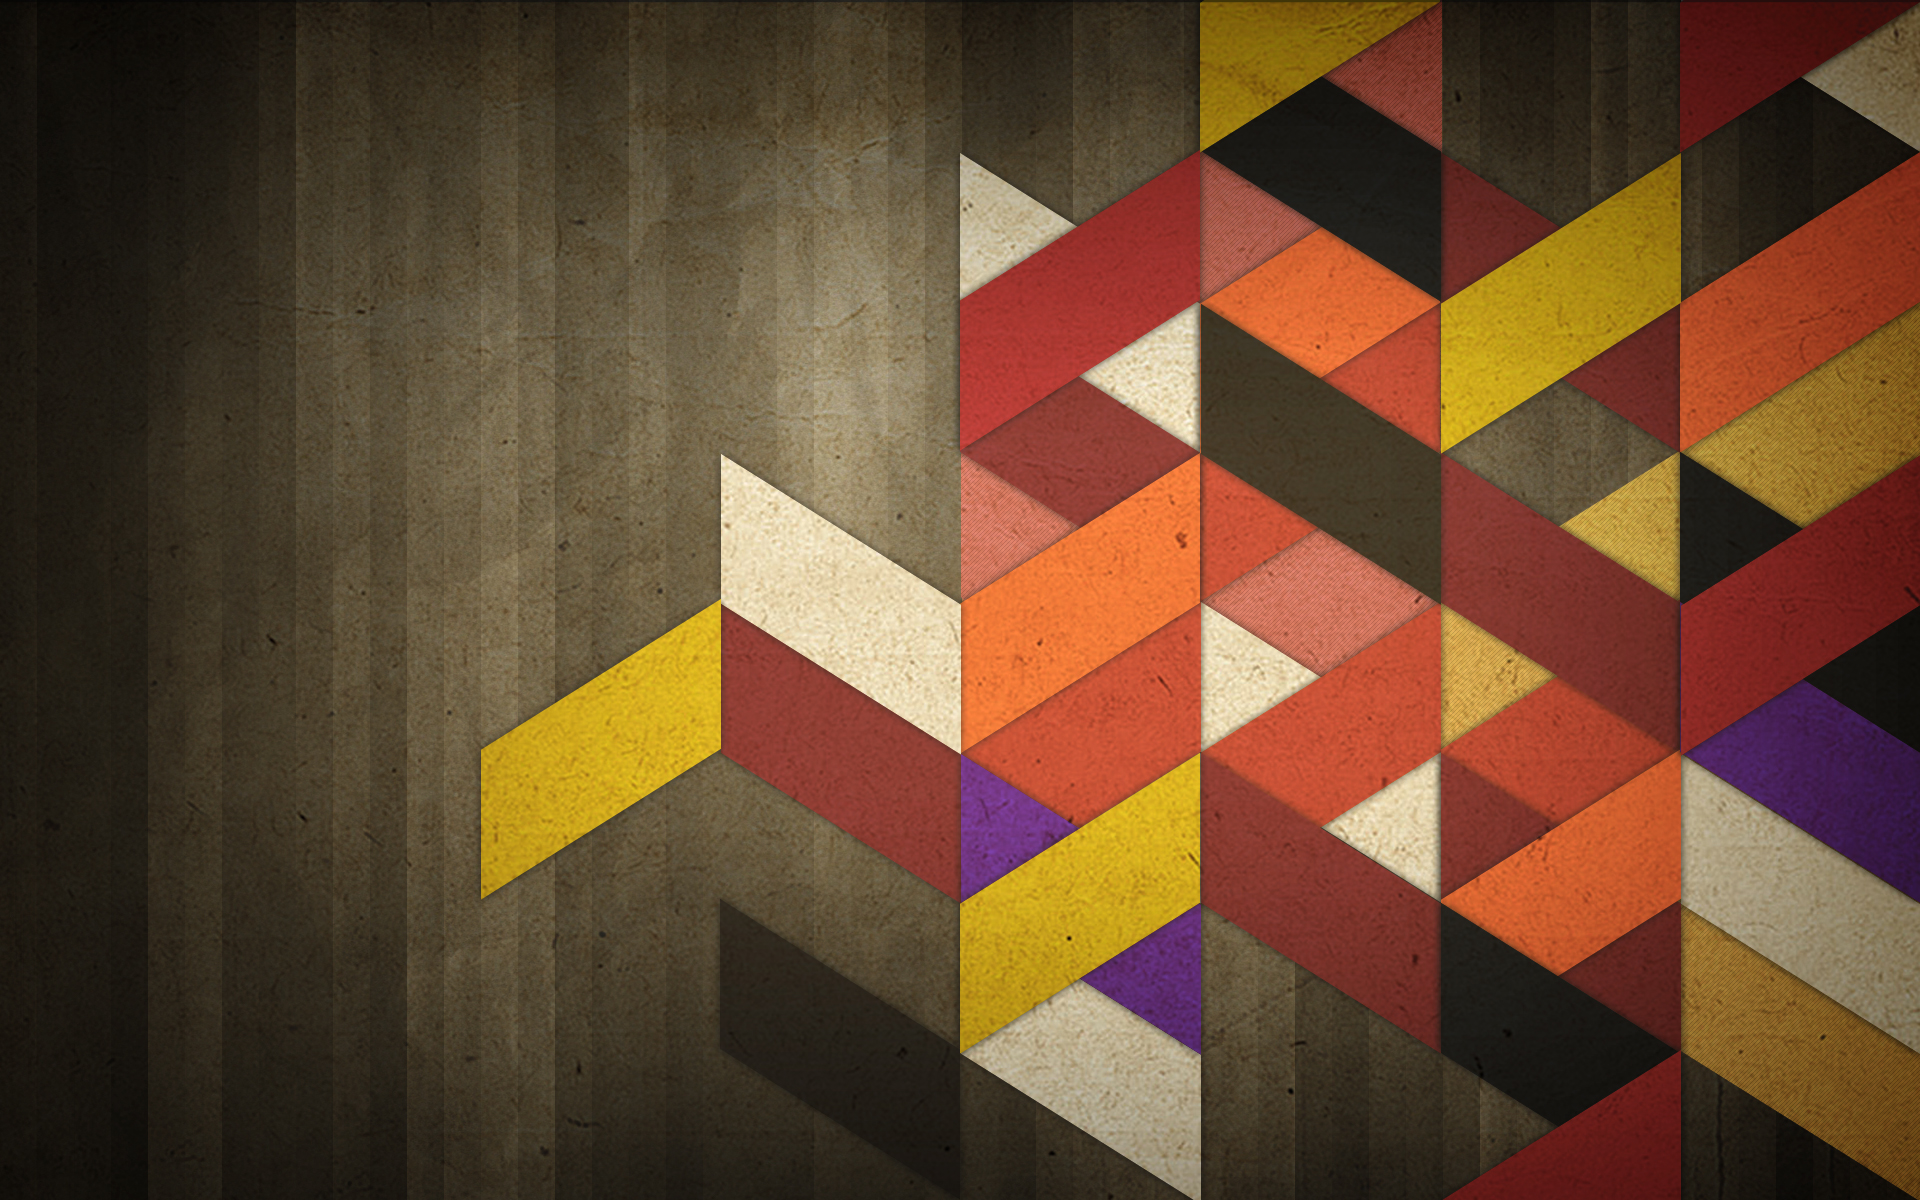 Retro Wallpapers 1920x1200